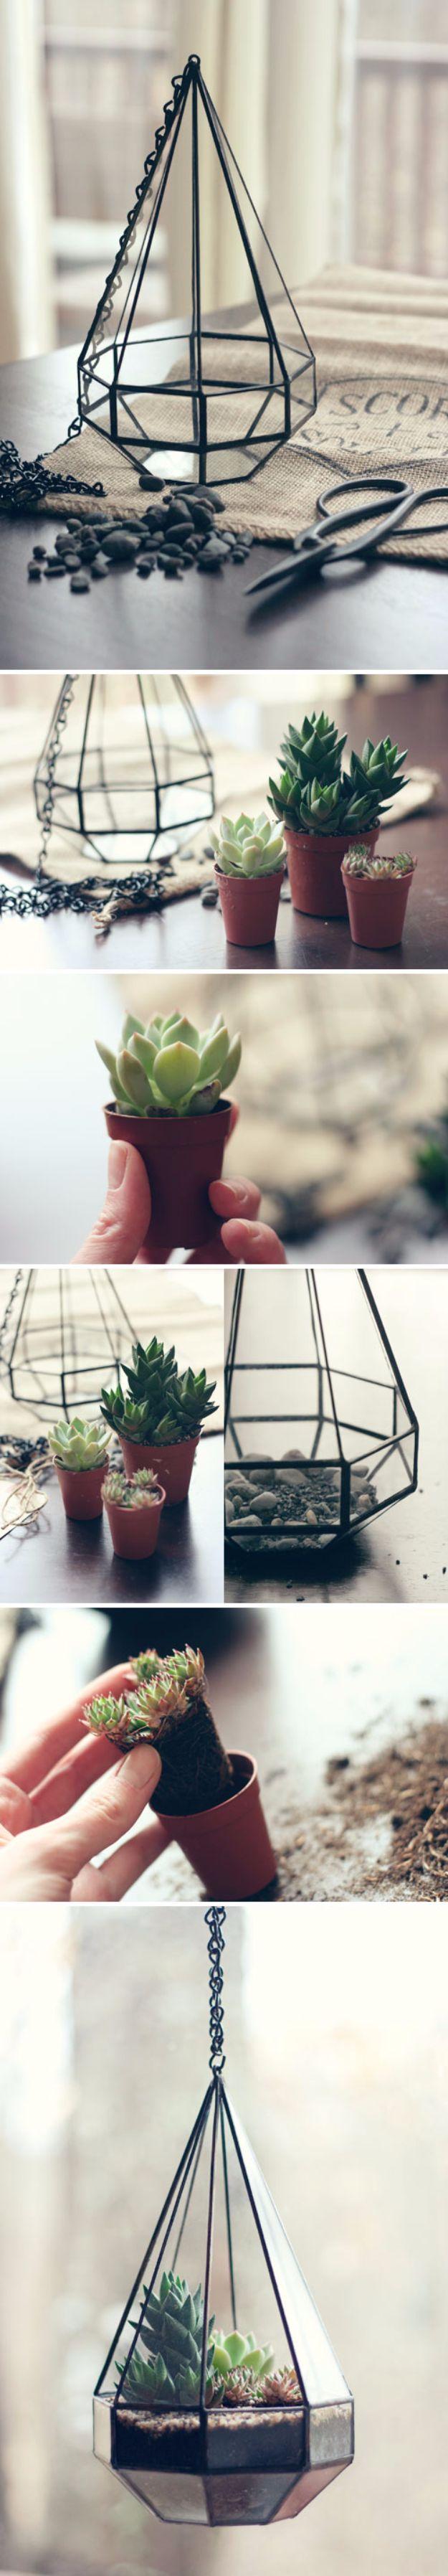 DIY Terrarium Ideas - Hanging Glass Terrarium - Cool Terrariums and Crafts With Mason Jars, Succulents, Wood, Geometric Designs and Reptile, Acquarium - Easy DIY Terrariums for Adults and Kids To Make at Home http://diyjoy.com/diy-terrarium-ideas